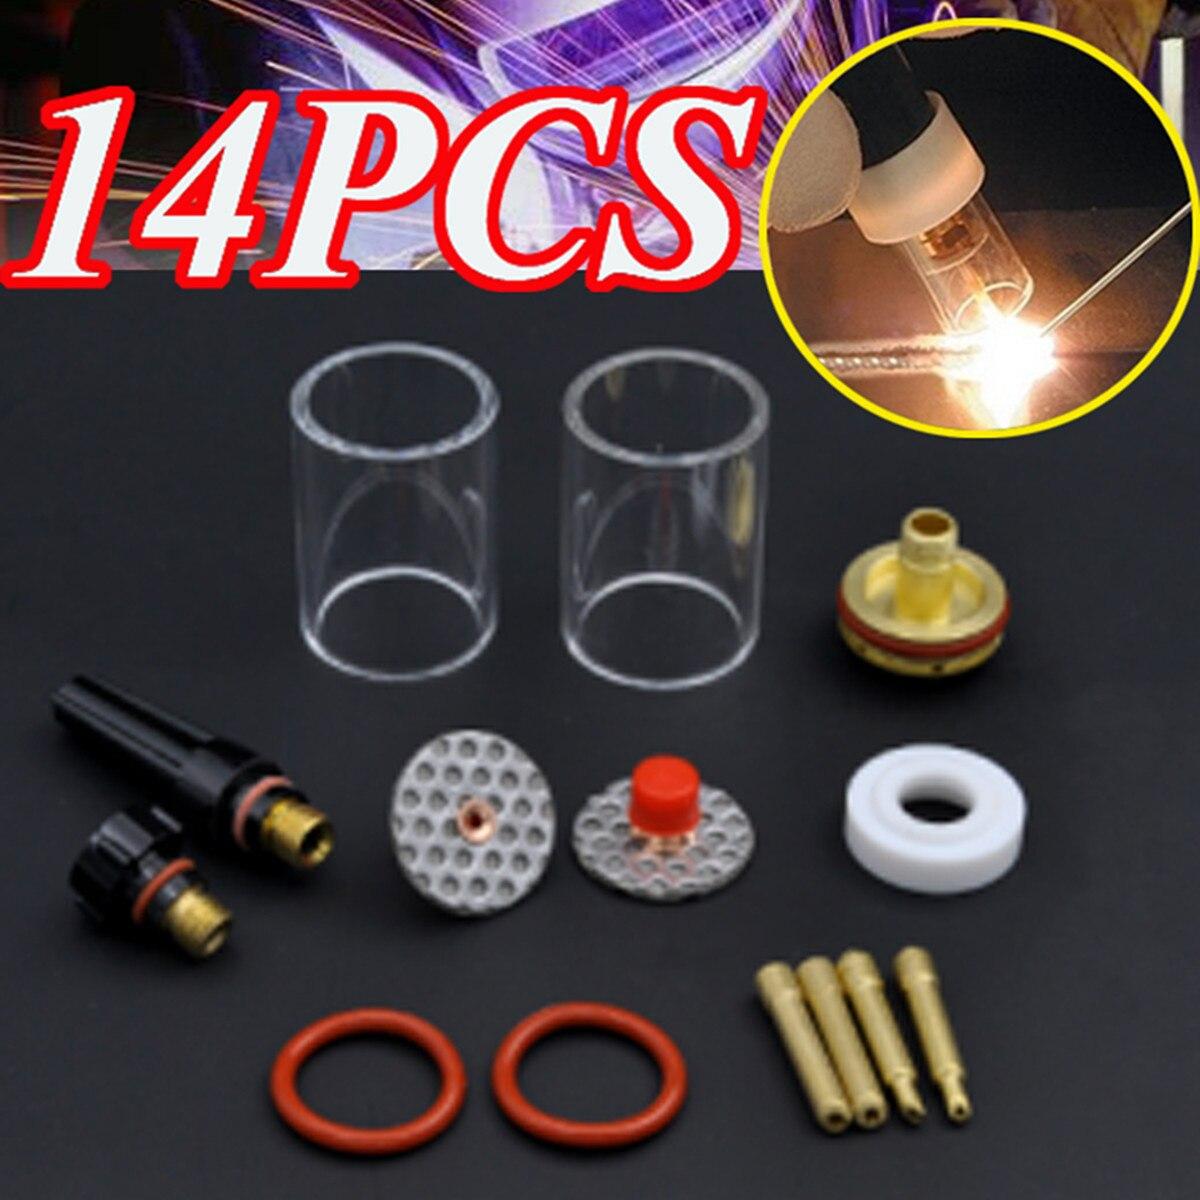 Hot Sale 14PCS 1.6mm 1/16 TIG Welding Torch Stubby Gas Lens Glass Cup Kit For WP17/18/26 1set 14pcs tig welding torch stubby gas lens glass pyrex cup kit 3 2mm 1 8 for wp17 18 26 welding series